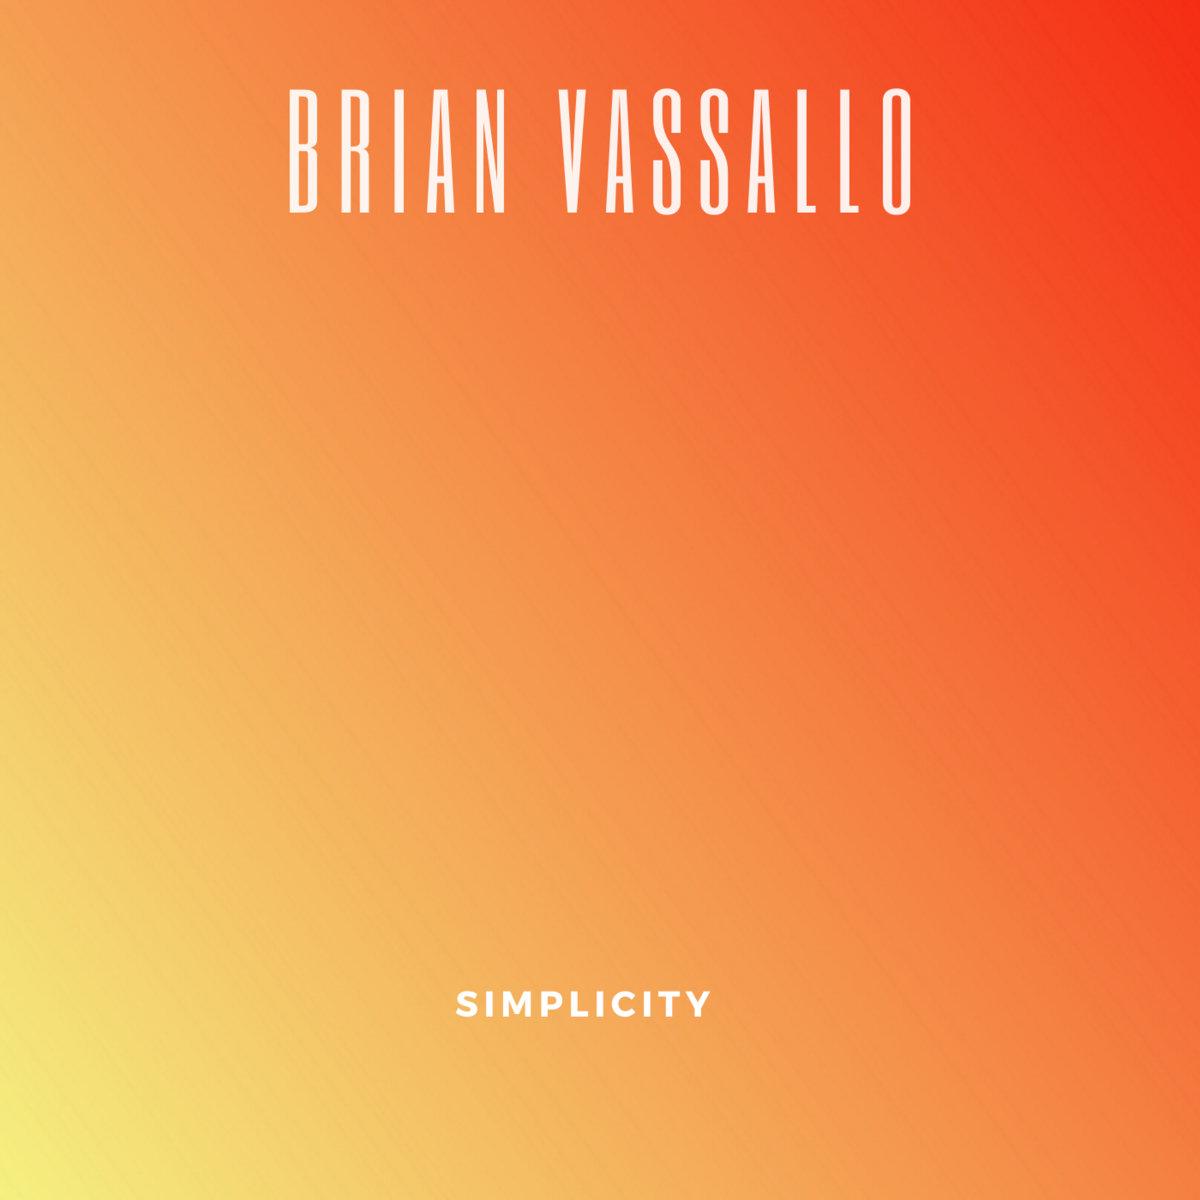 Simplicity by BRIAN VASSALLO